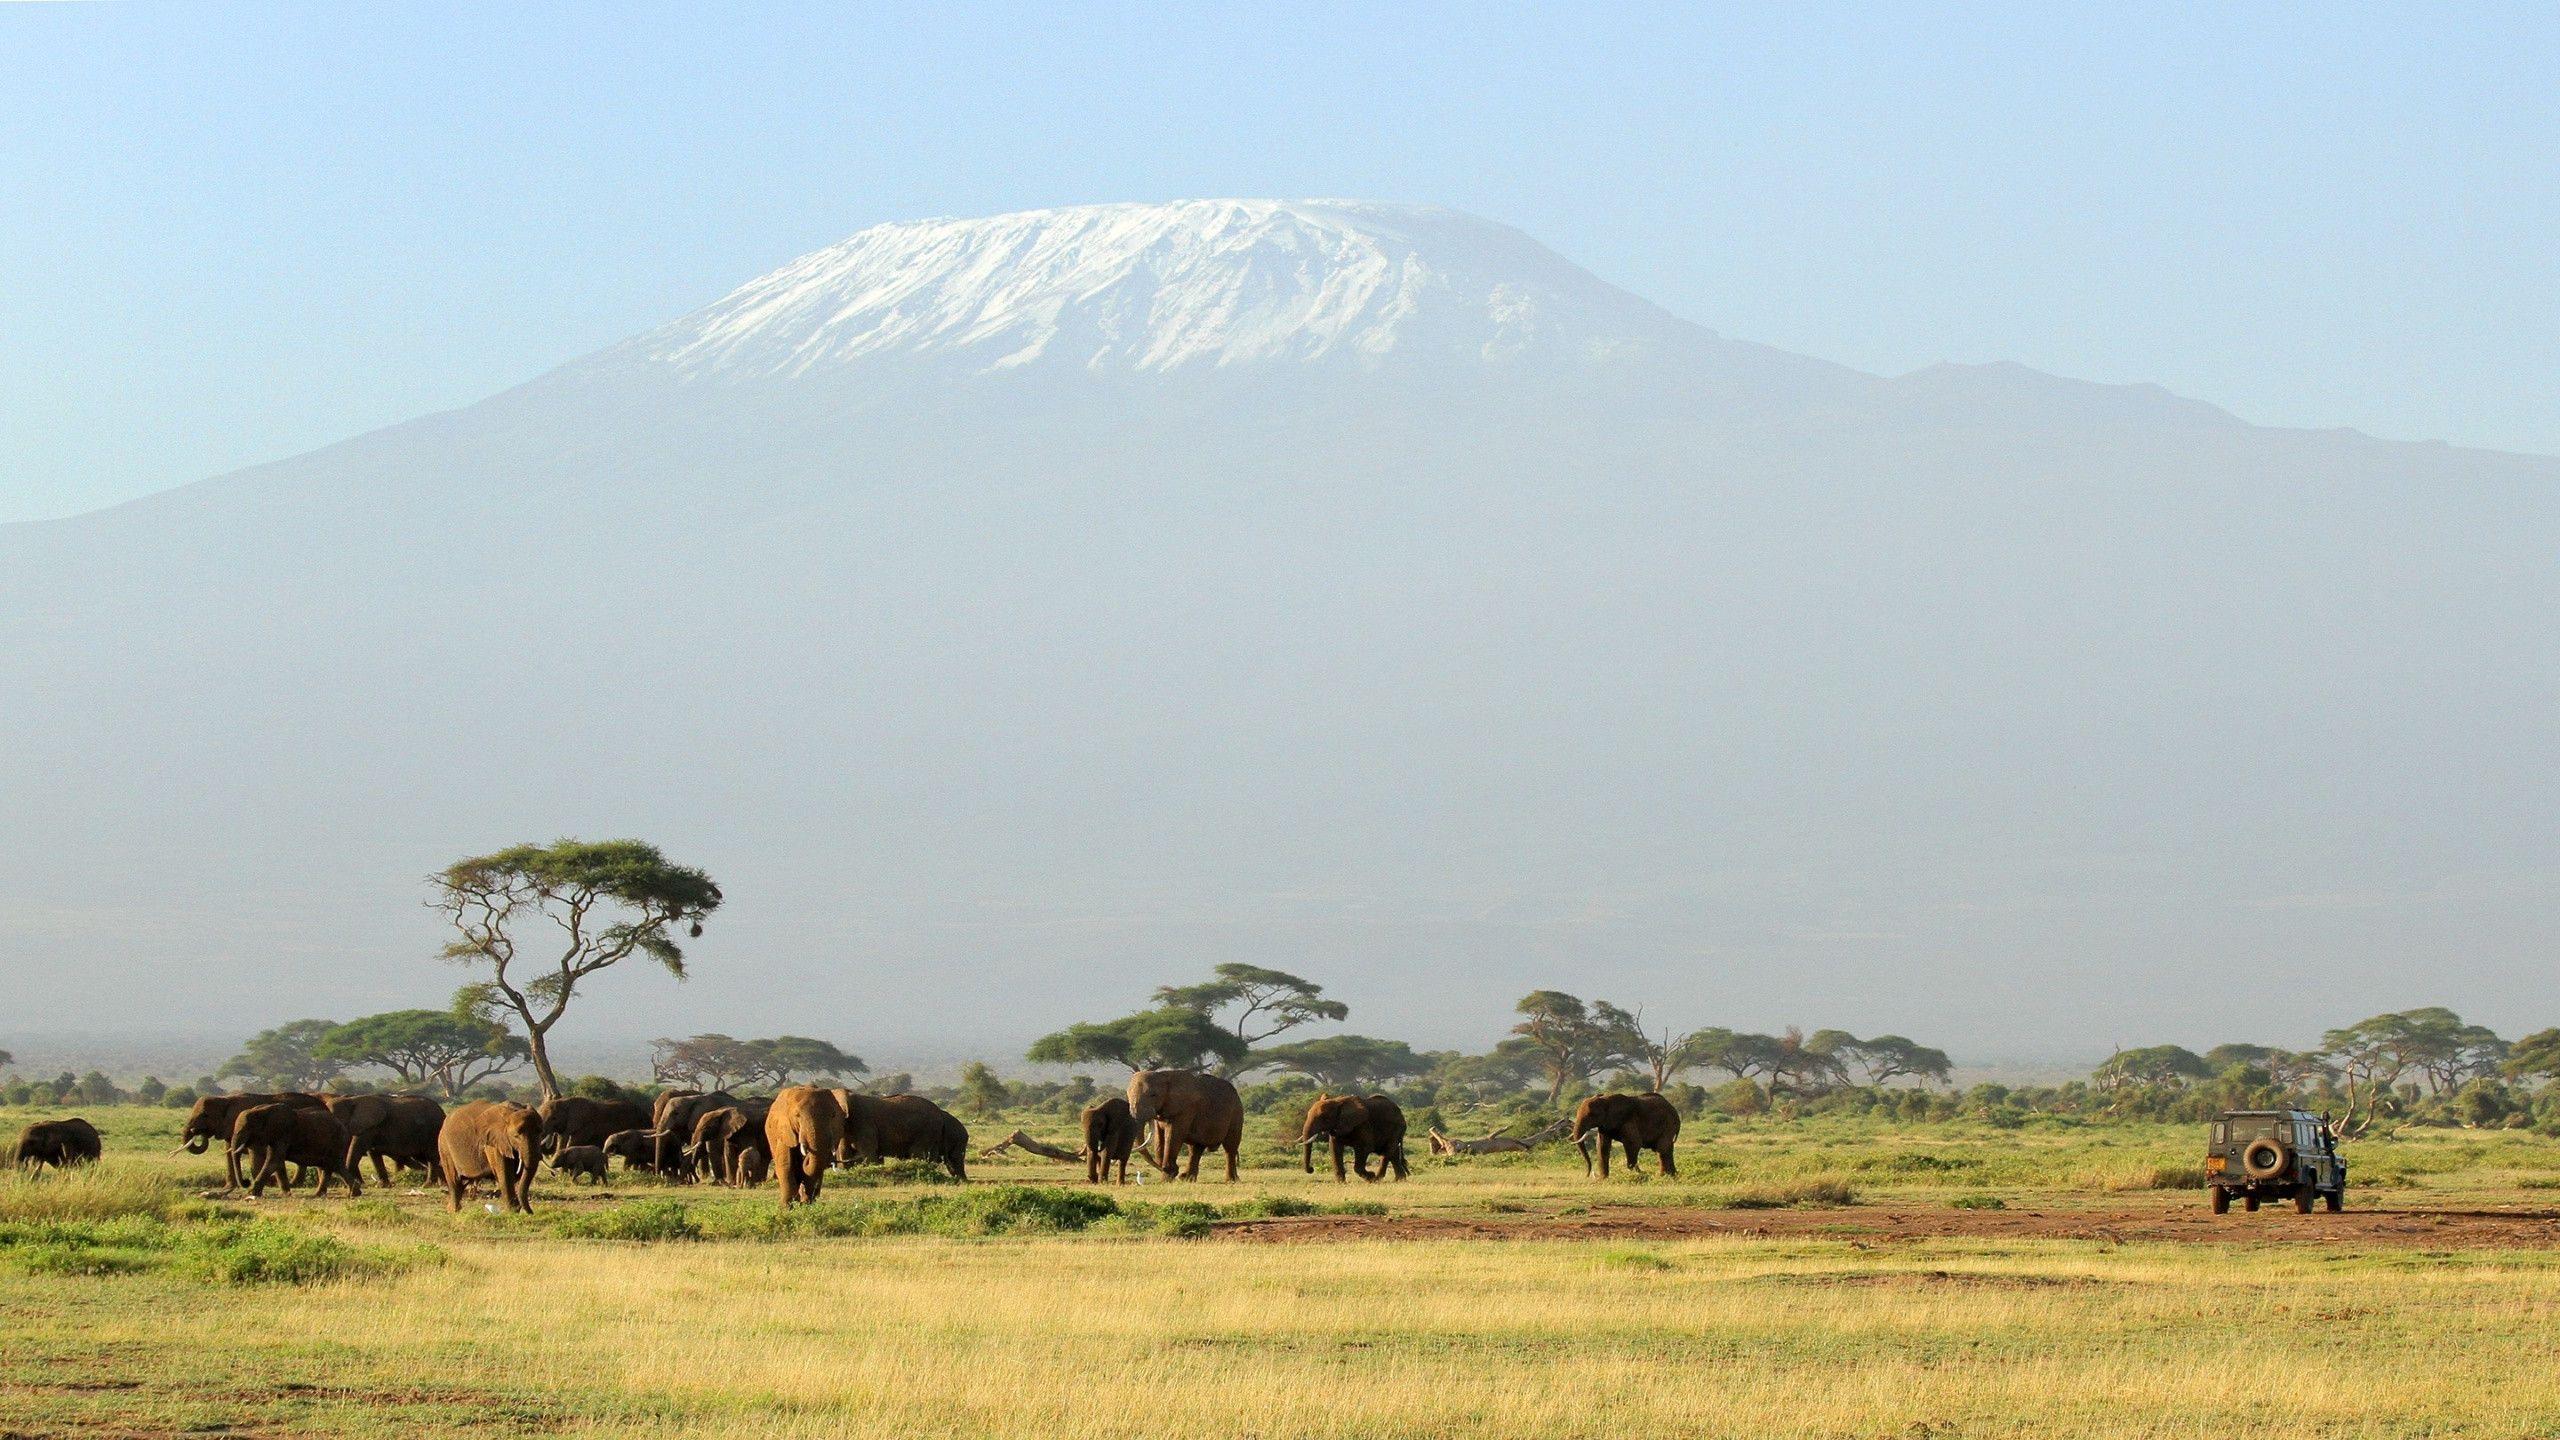 HD Kilimanjaro Safari Wallpaper | Download Free - 123474